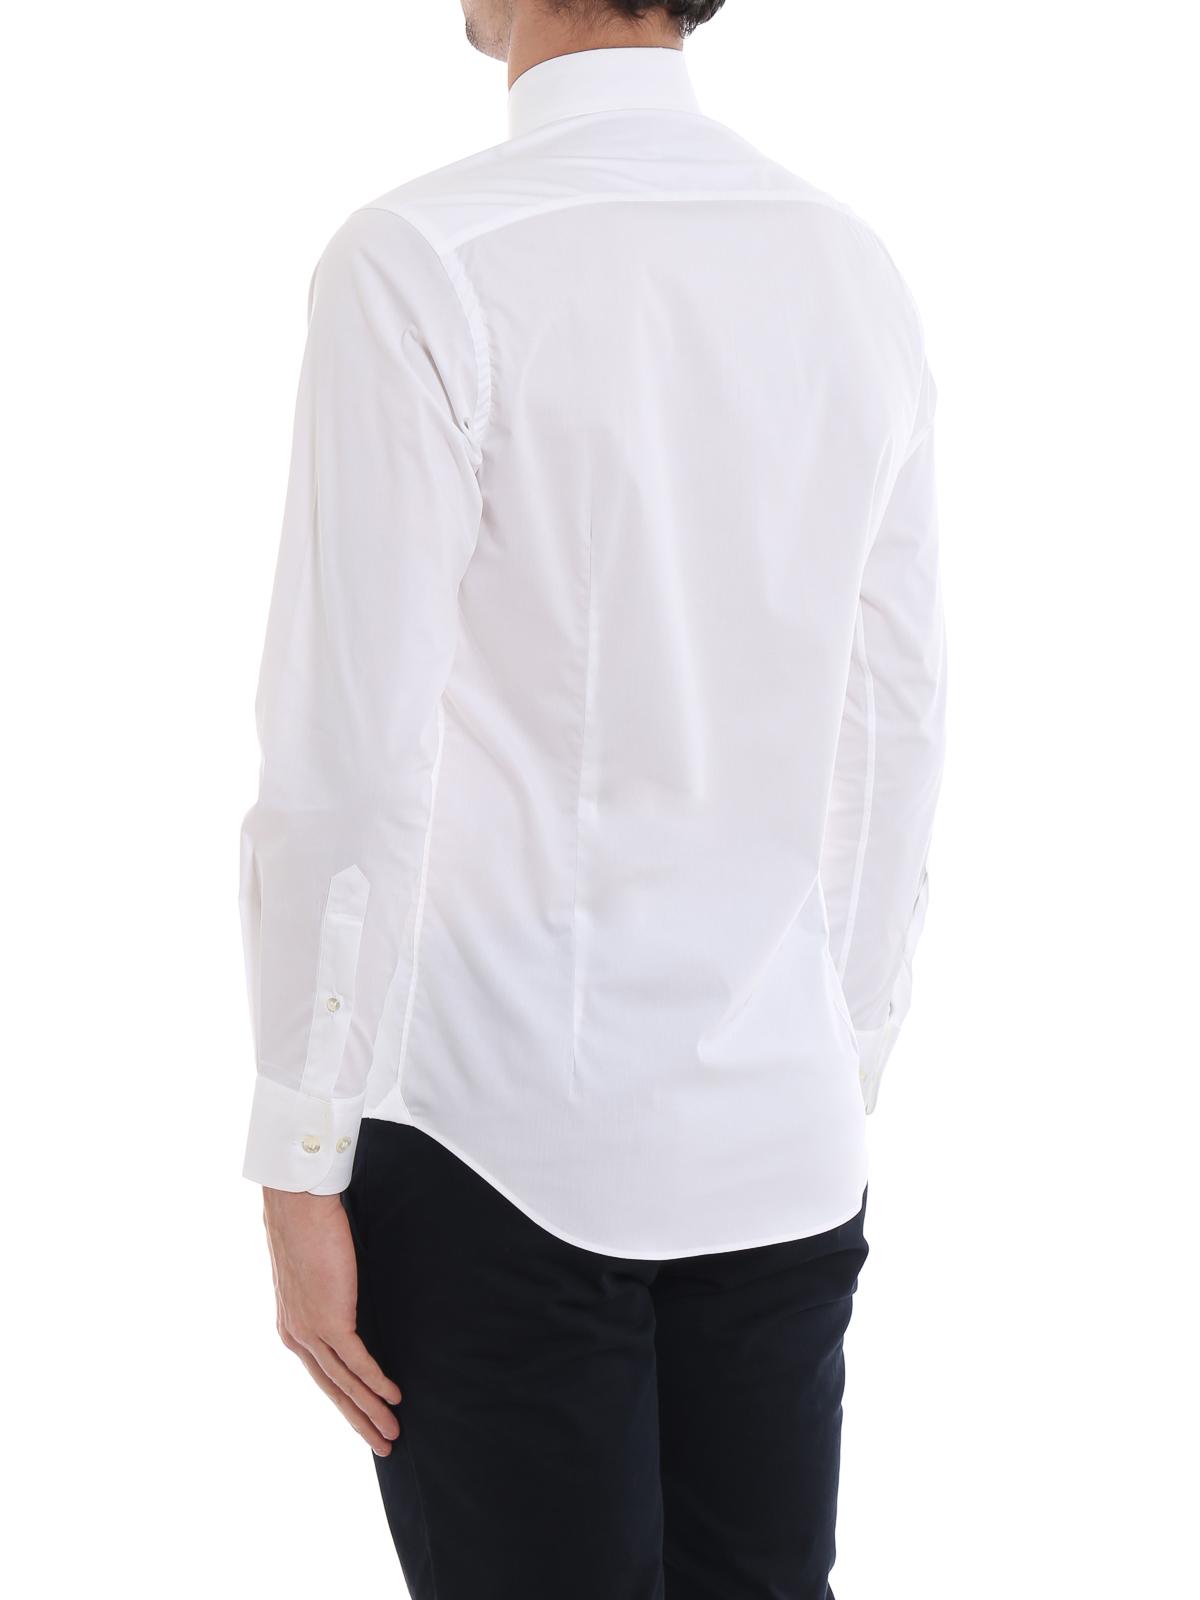 1d8c463d56 Etro - Camicia bianca b/d in cotone stretch con logo - camicie ...